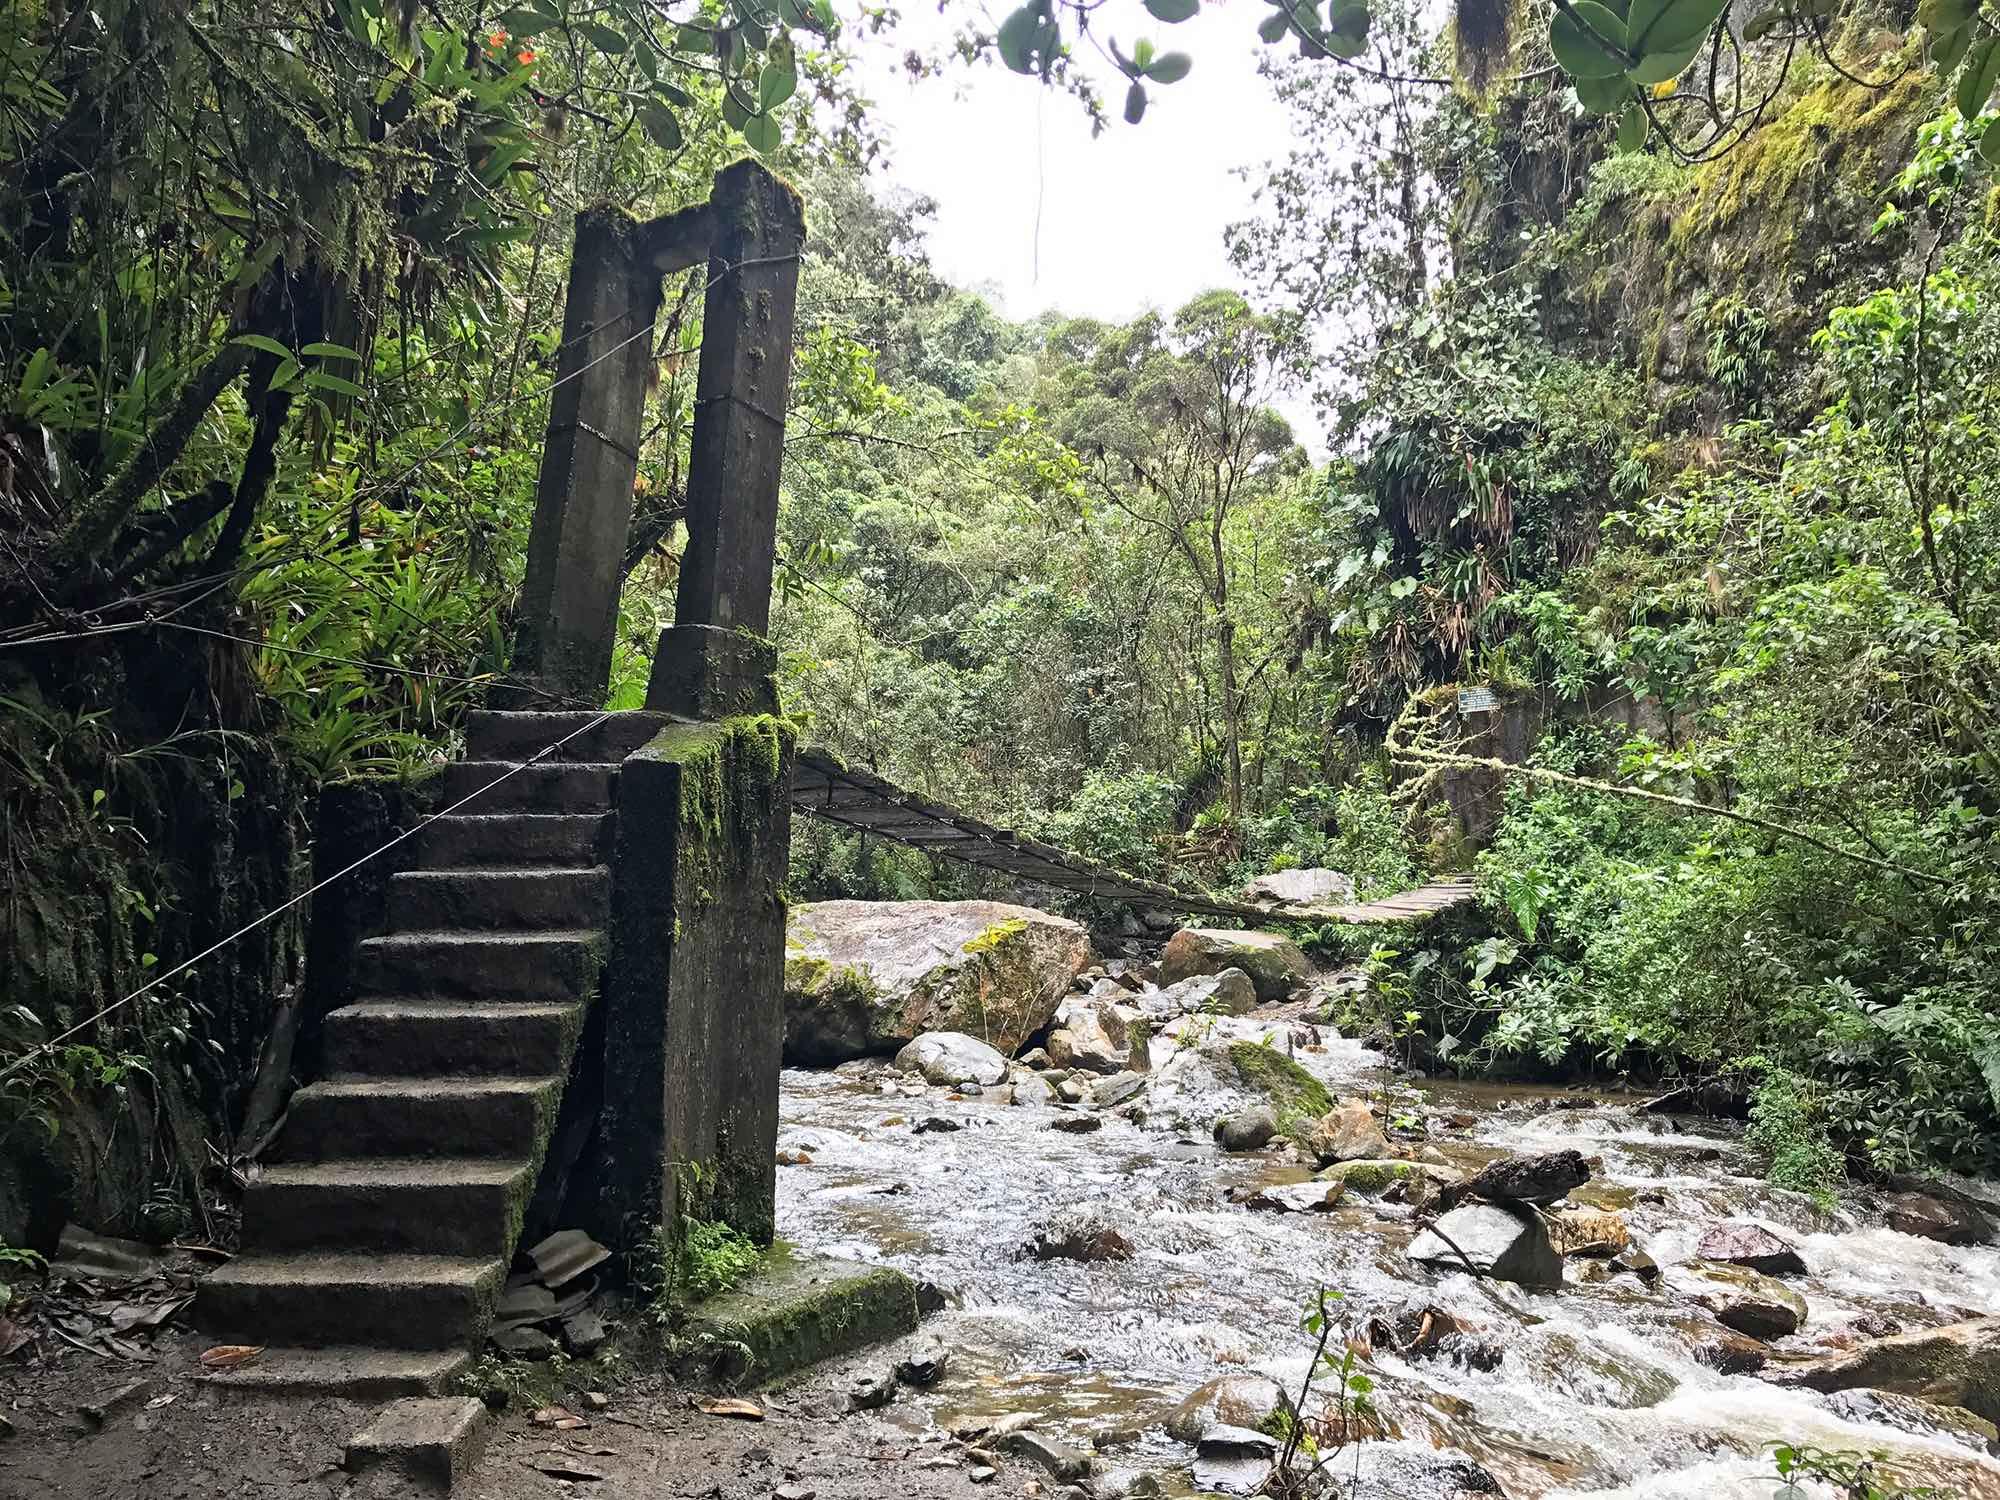 Bridge | Hiking Cocora Valley, Colombia